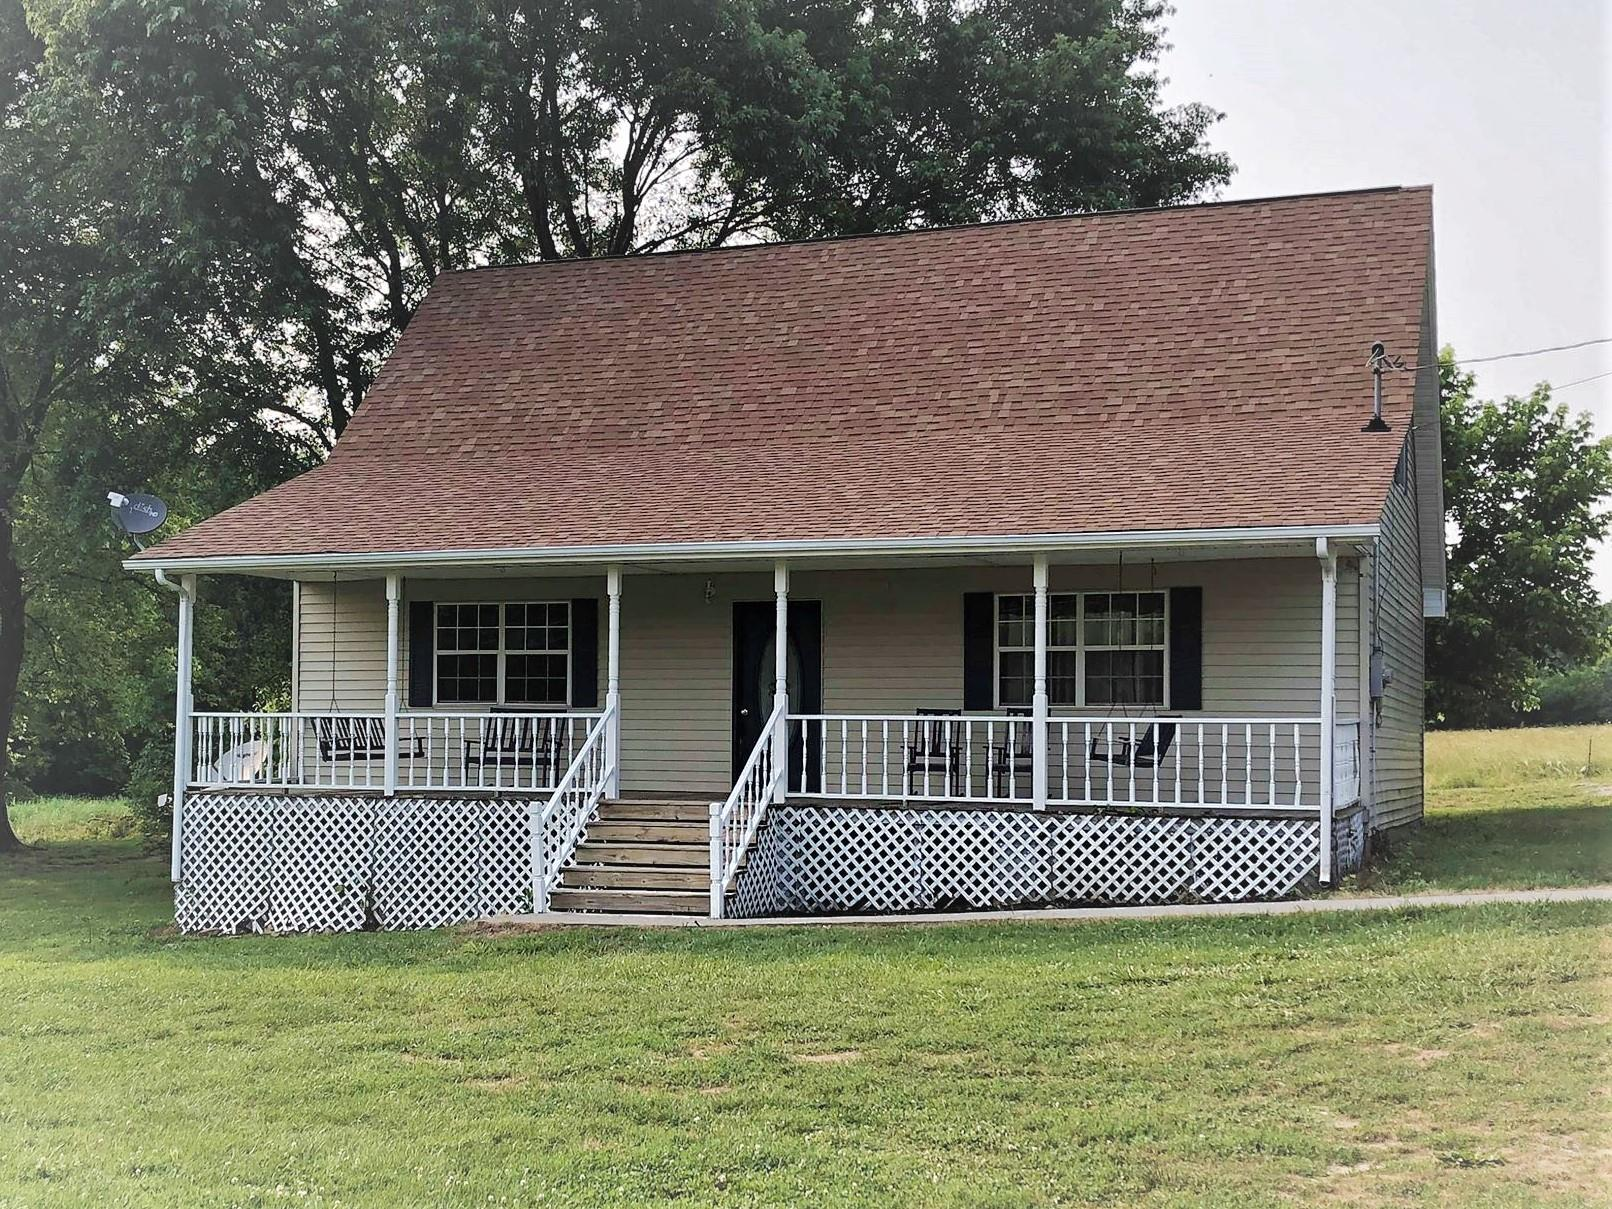 10915 Bold Springs Rd, MC EWEN, TN 37101 - MC EWEN, TN real estate listing